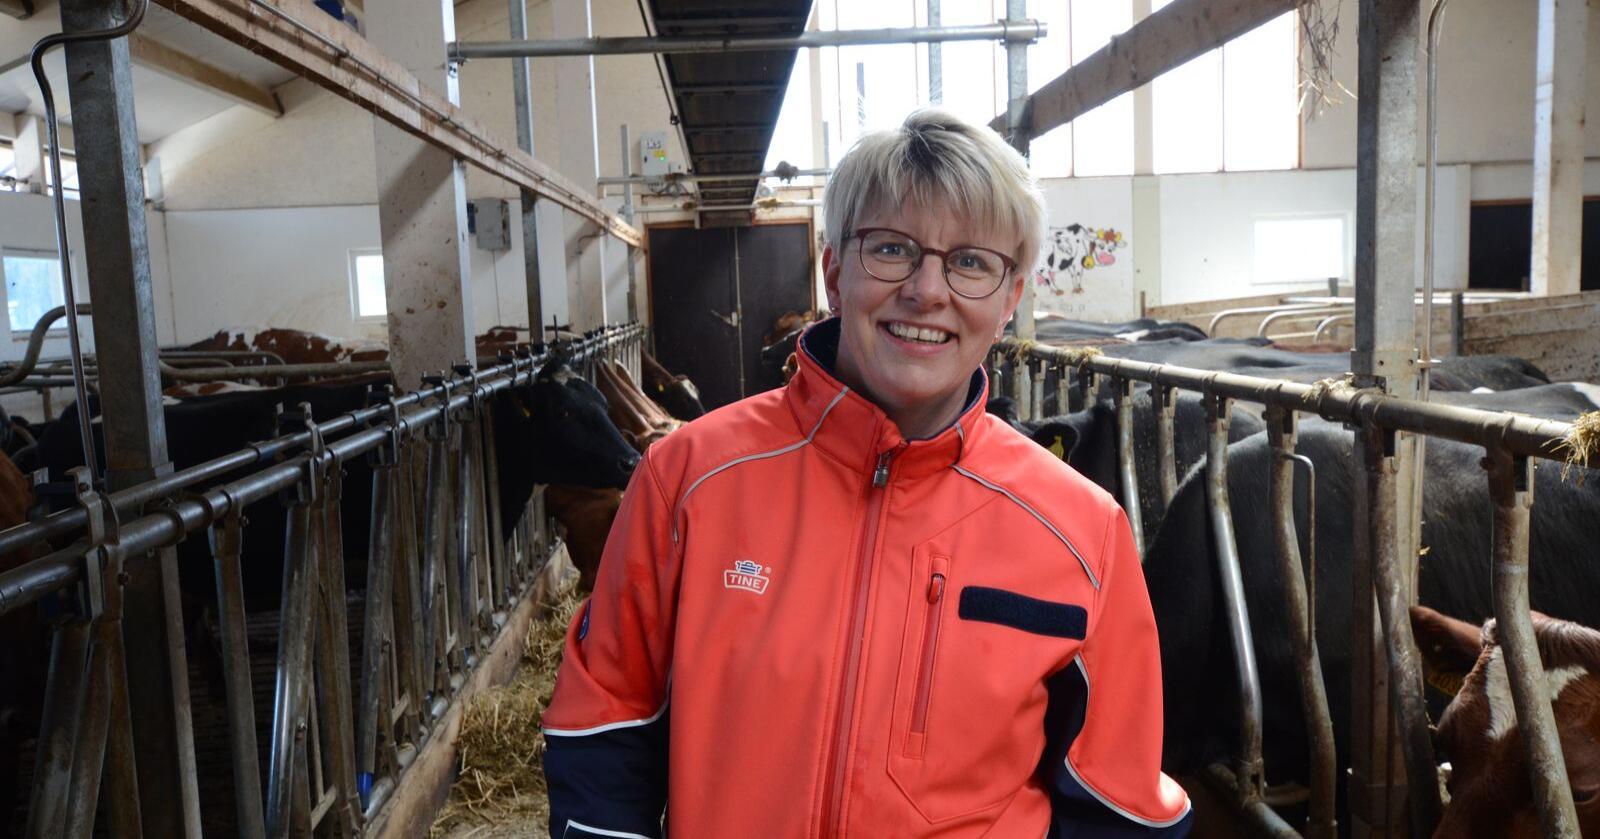 Det var stor enighet blant valgkomiteens medlemmer om at Marit Haugen skulle innstilles som styreleder for enda et år. Foto: Liv Jorunn D. Sagmo